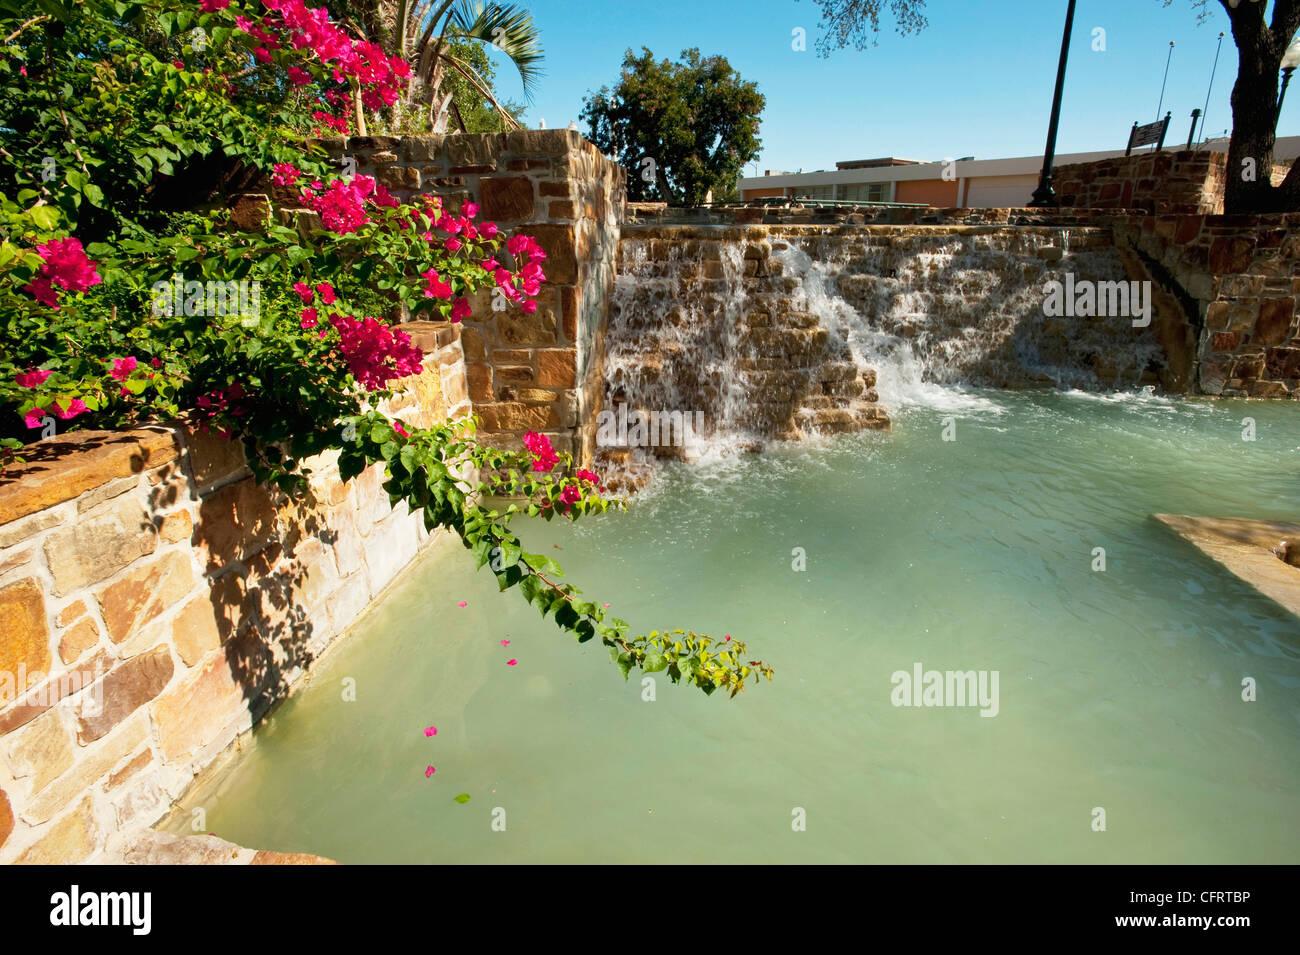 USA Texas San Antonio HemisFair Park Waterfall Fountain And Bougainvillea PLEASE CALL FOR SUPER HI RES FILES